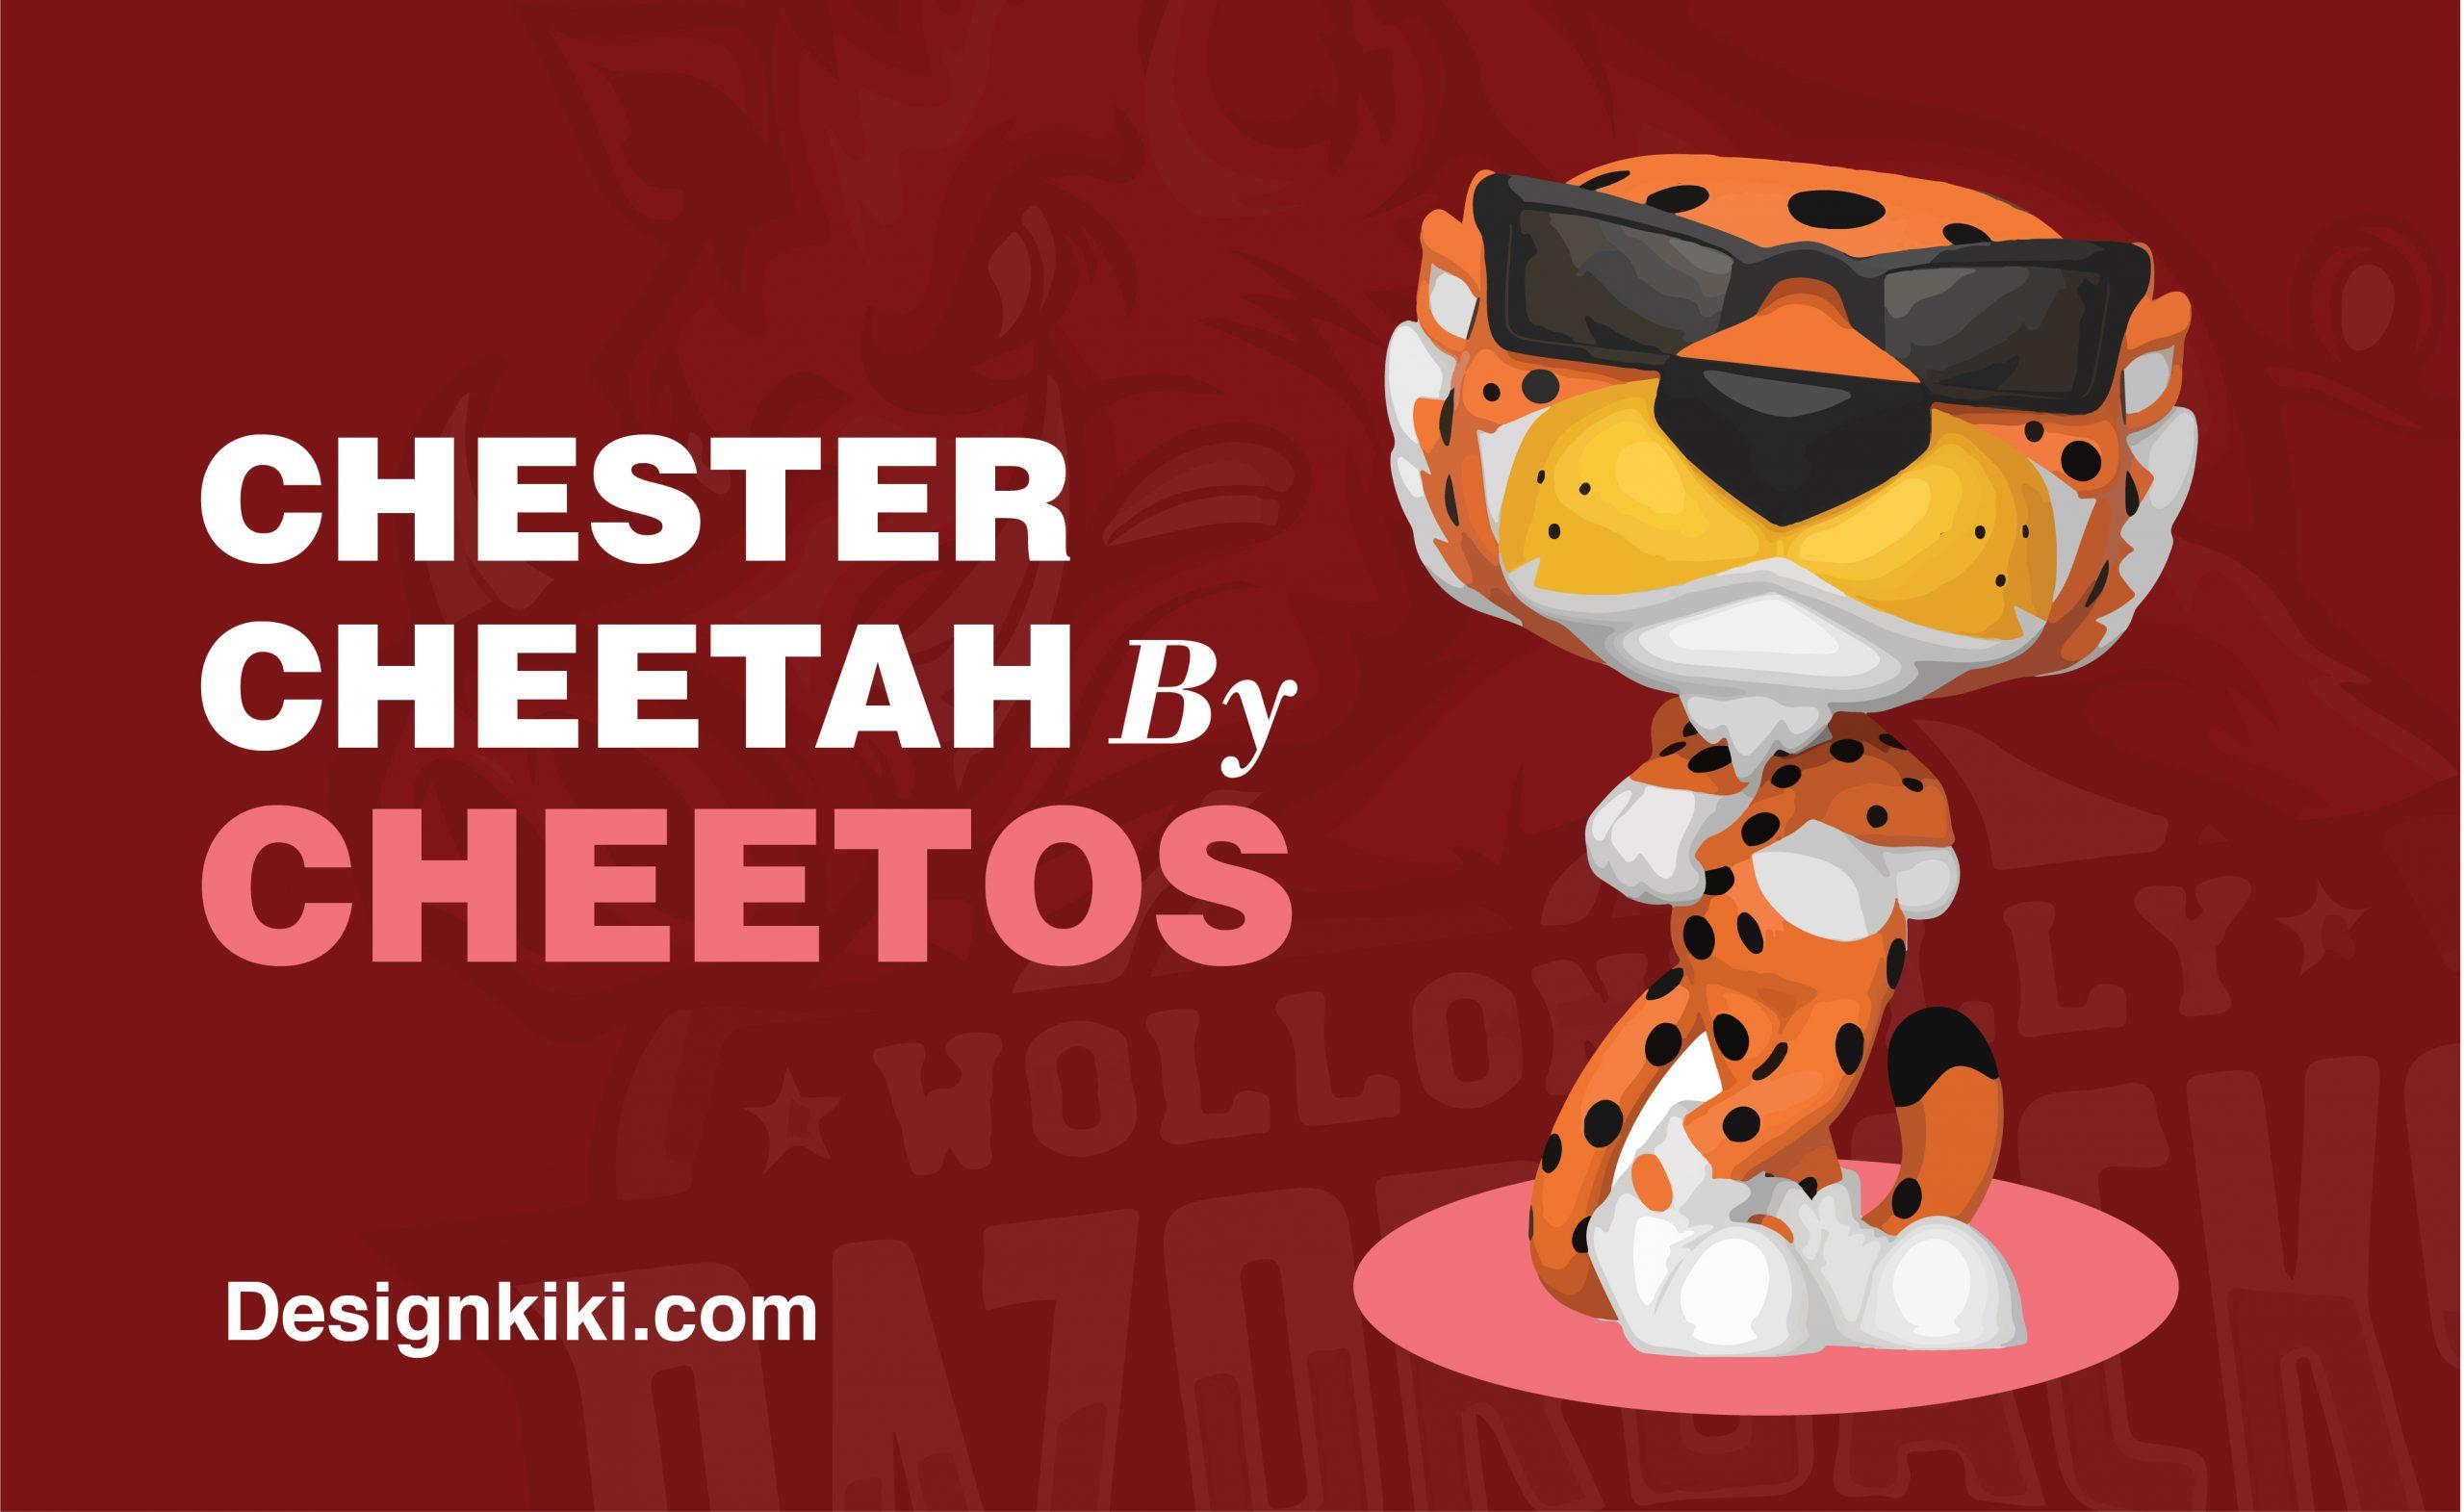 Cheetos mascot logos